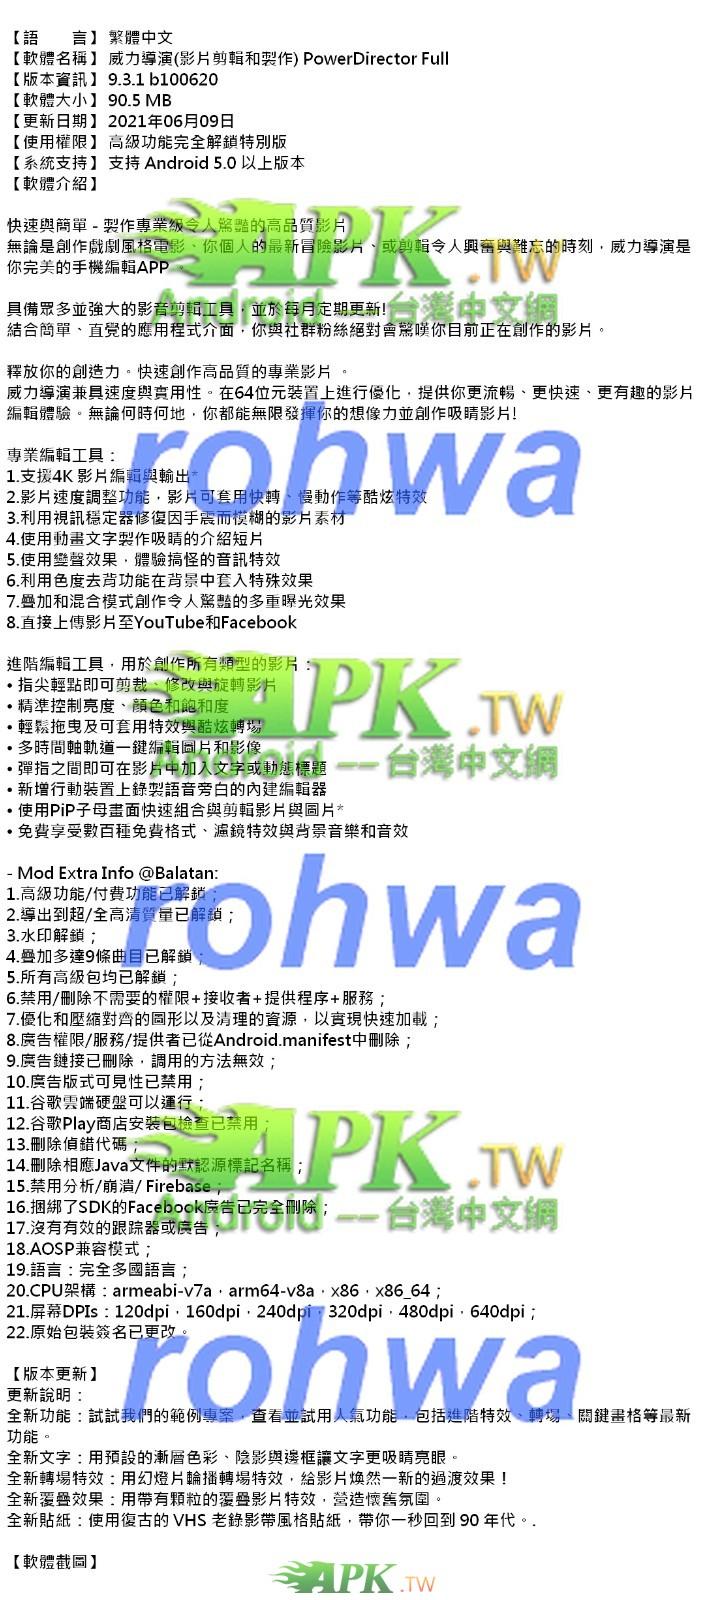 PowerDirector_Premium_9.3.1 APK_.jpg